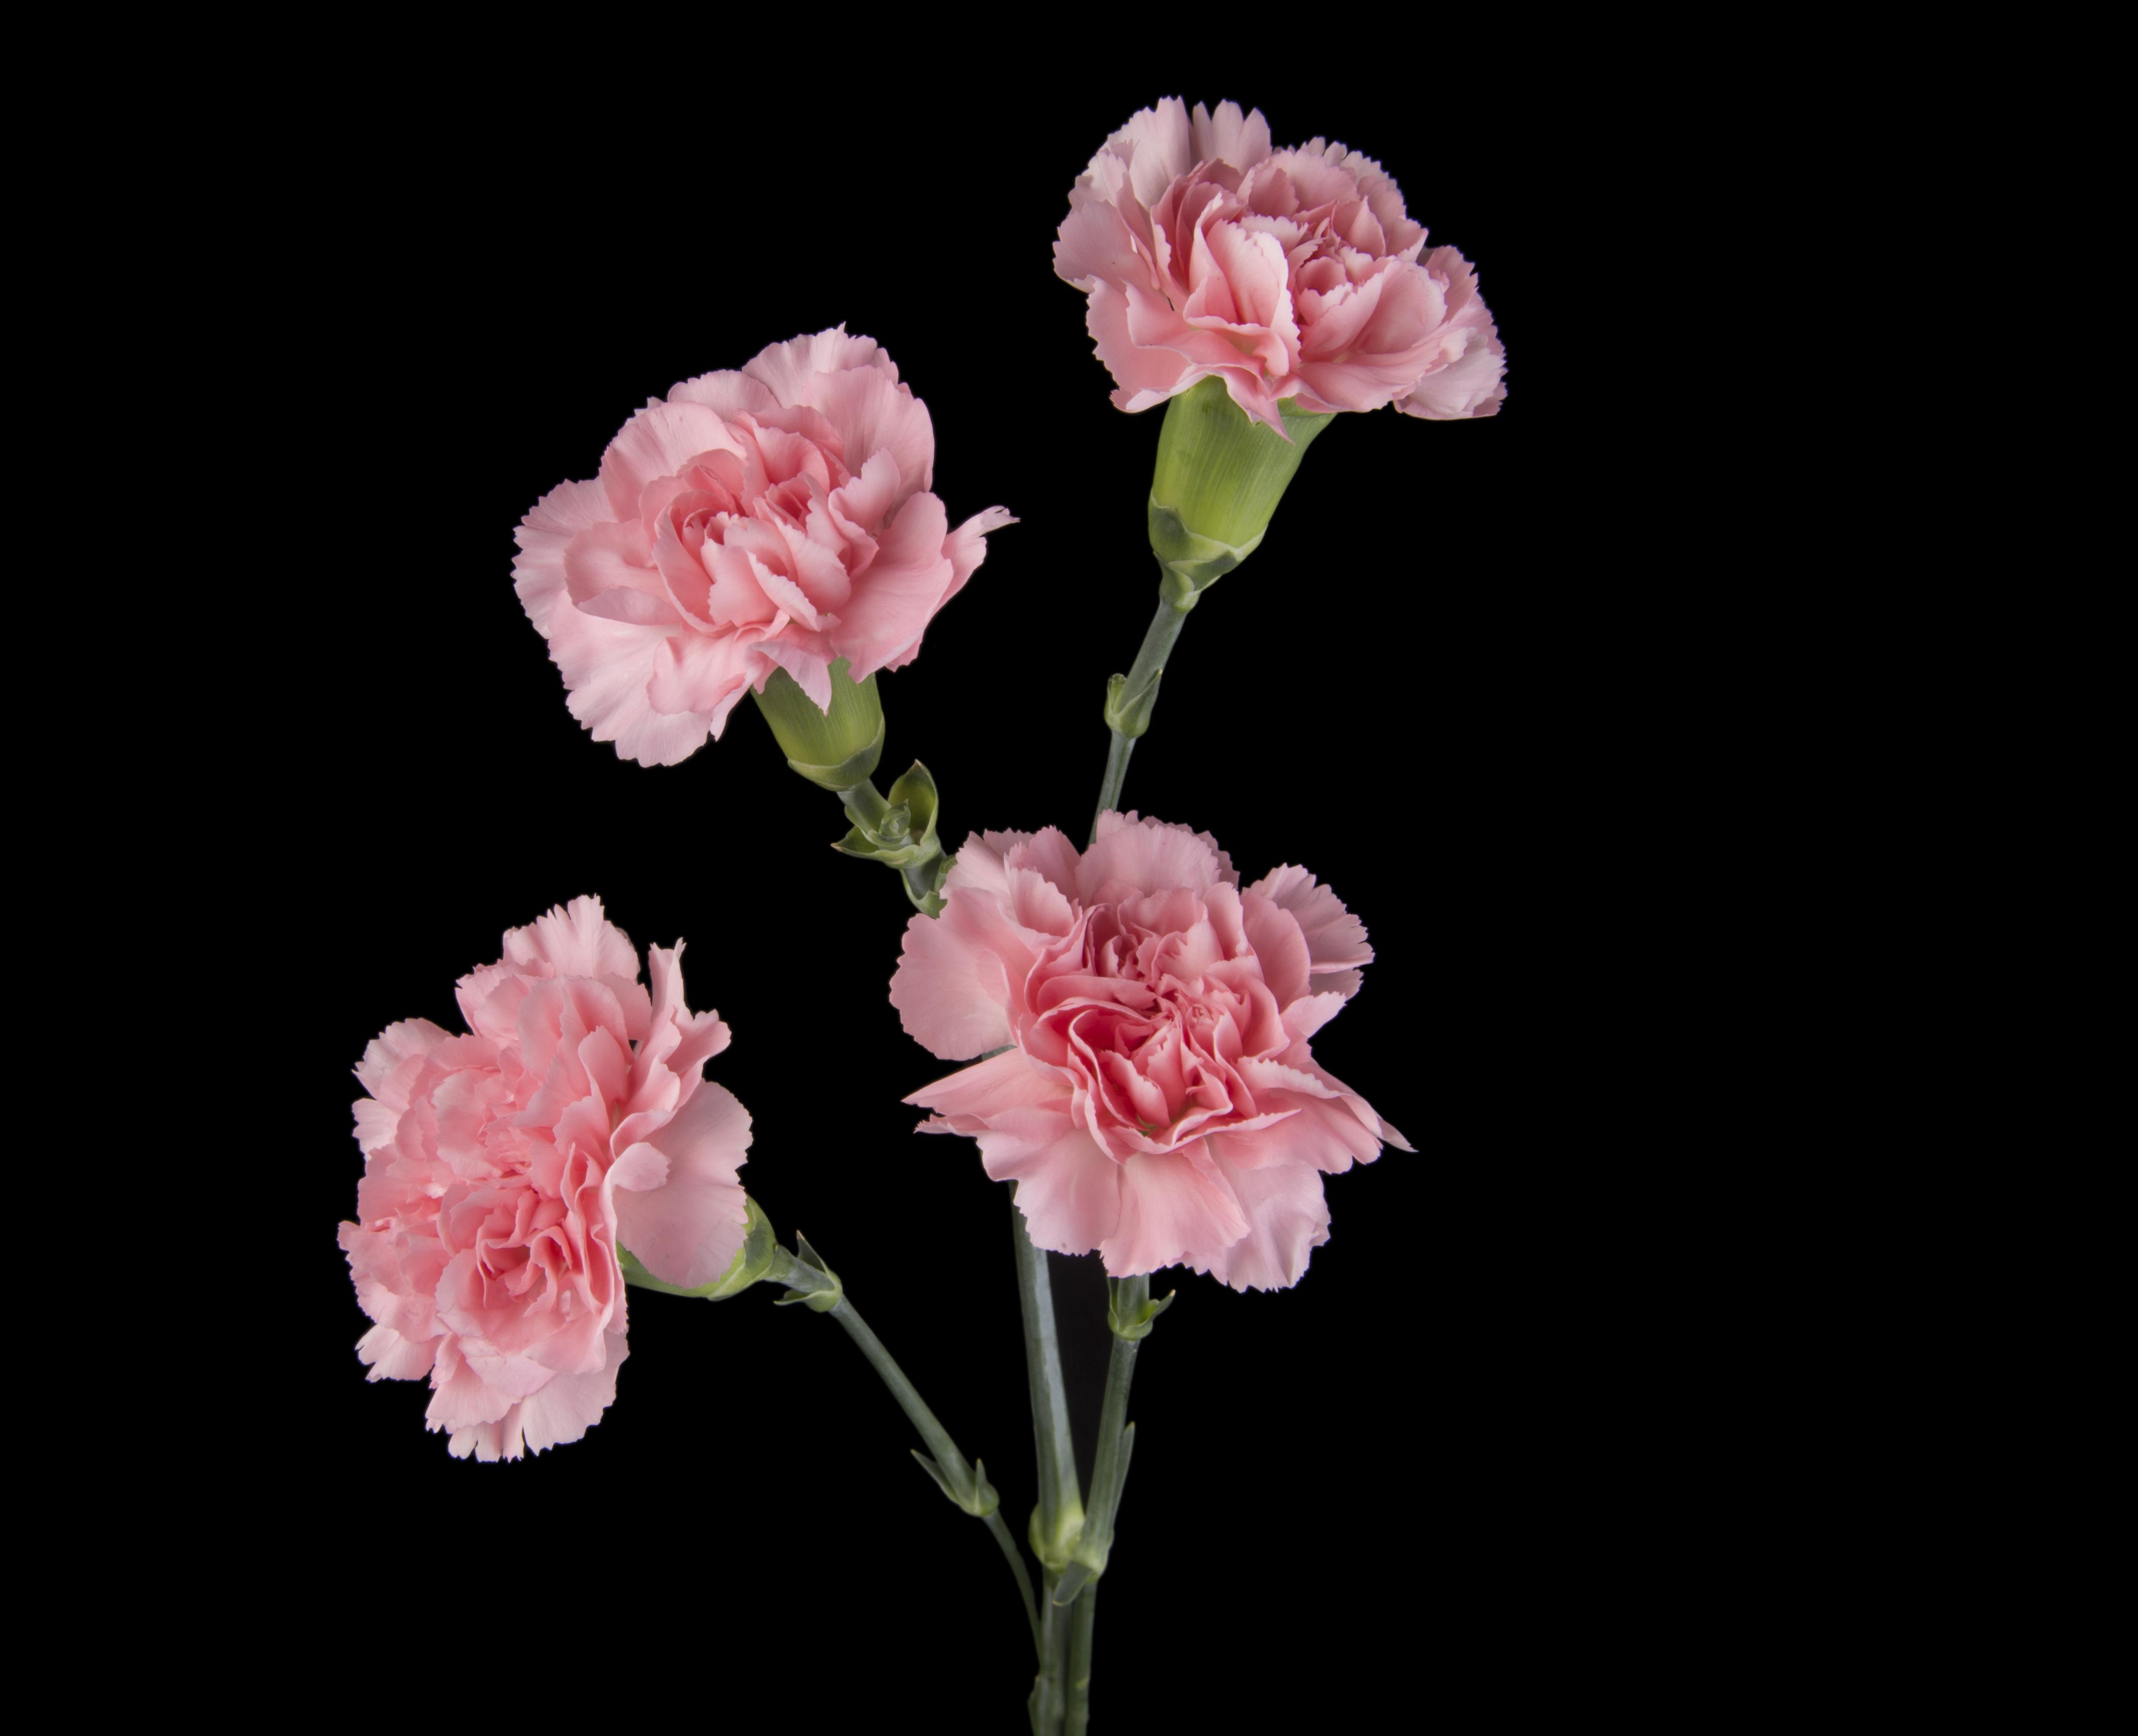 Euforia - pink